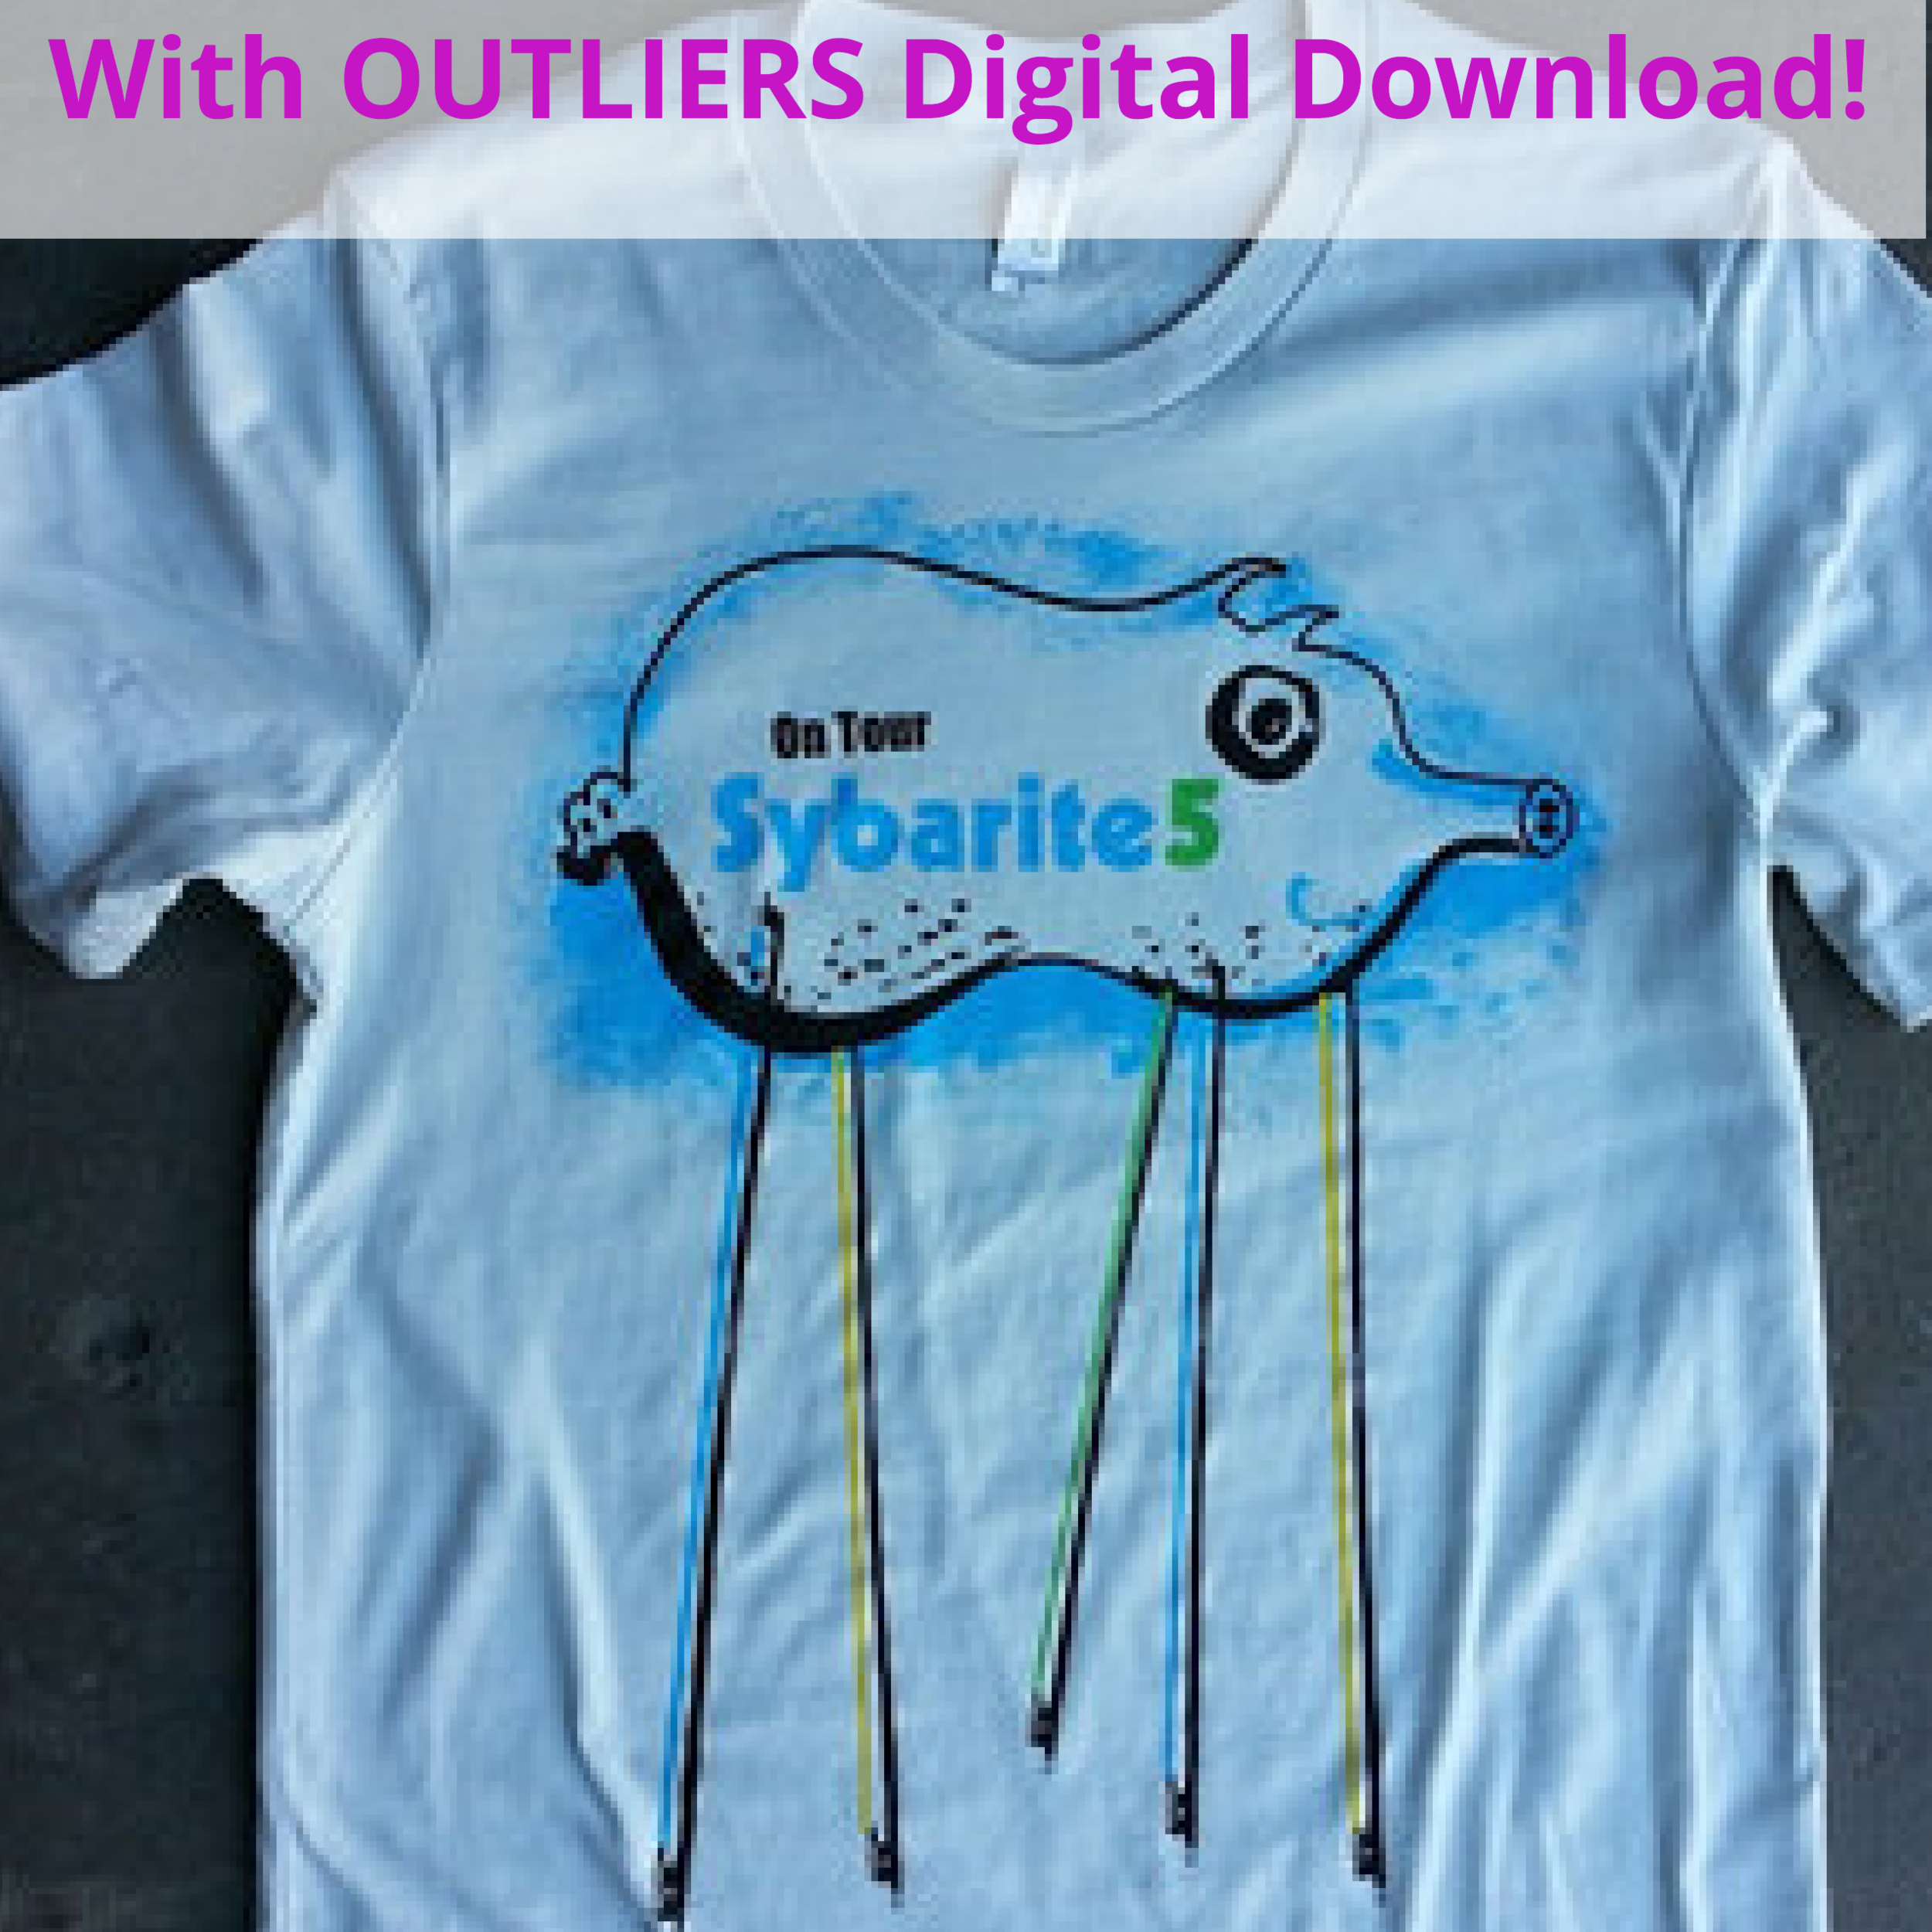 <b>Piggy<br></b><small>T-shirt + OUTLIERS Full Digital Download<br></small><b>$25</b>